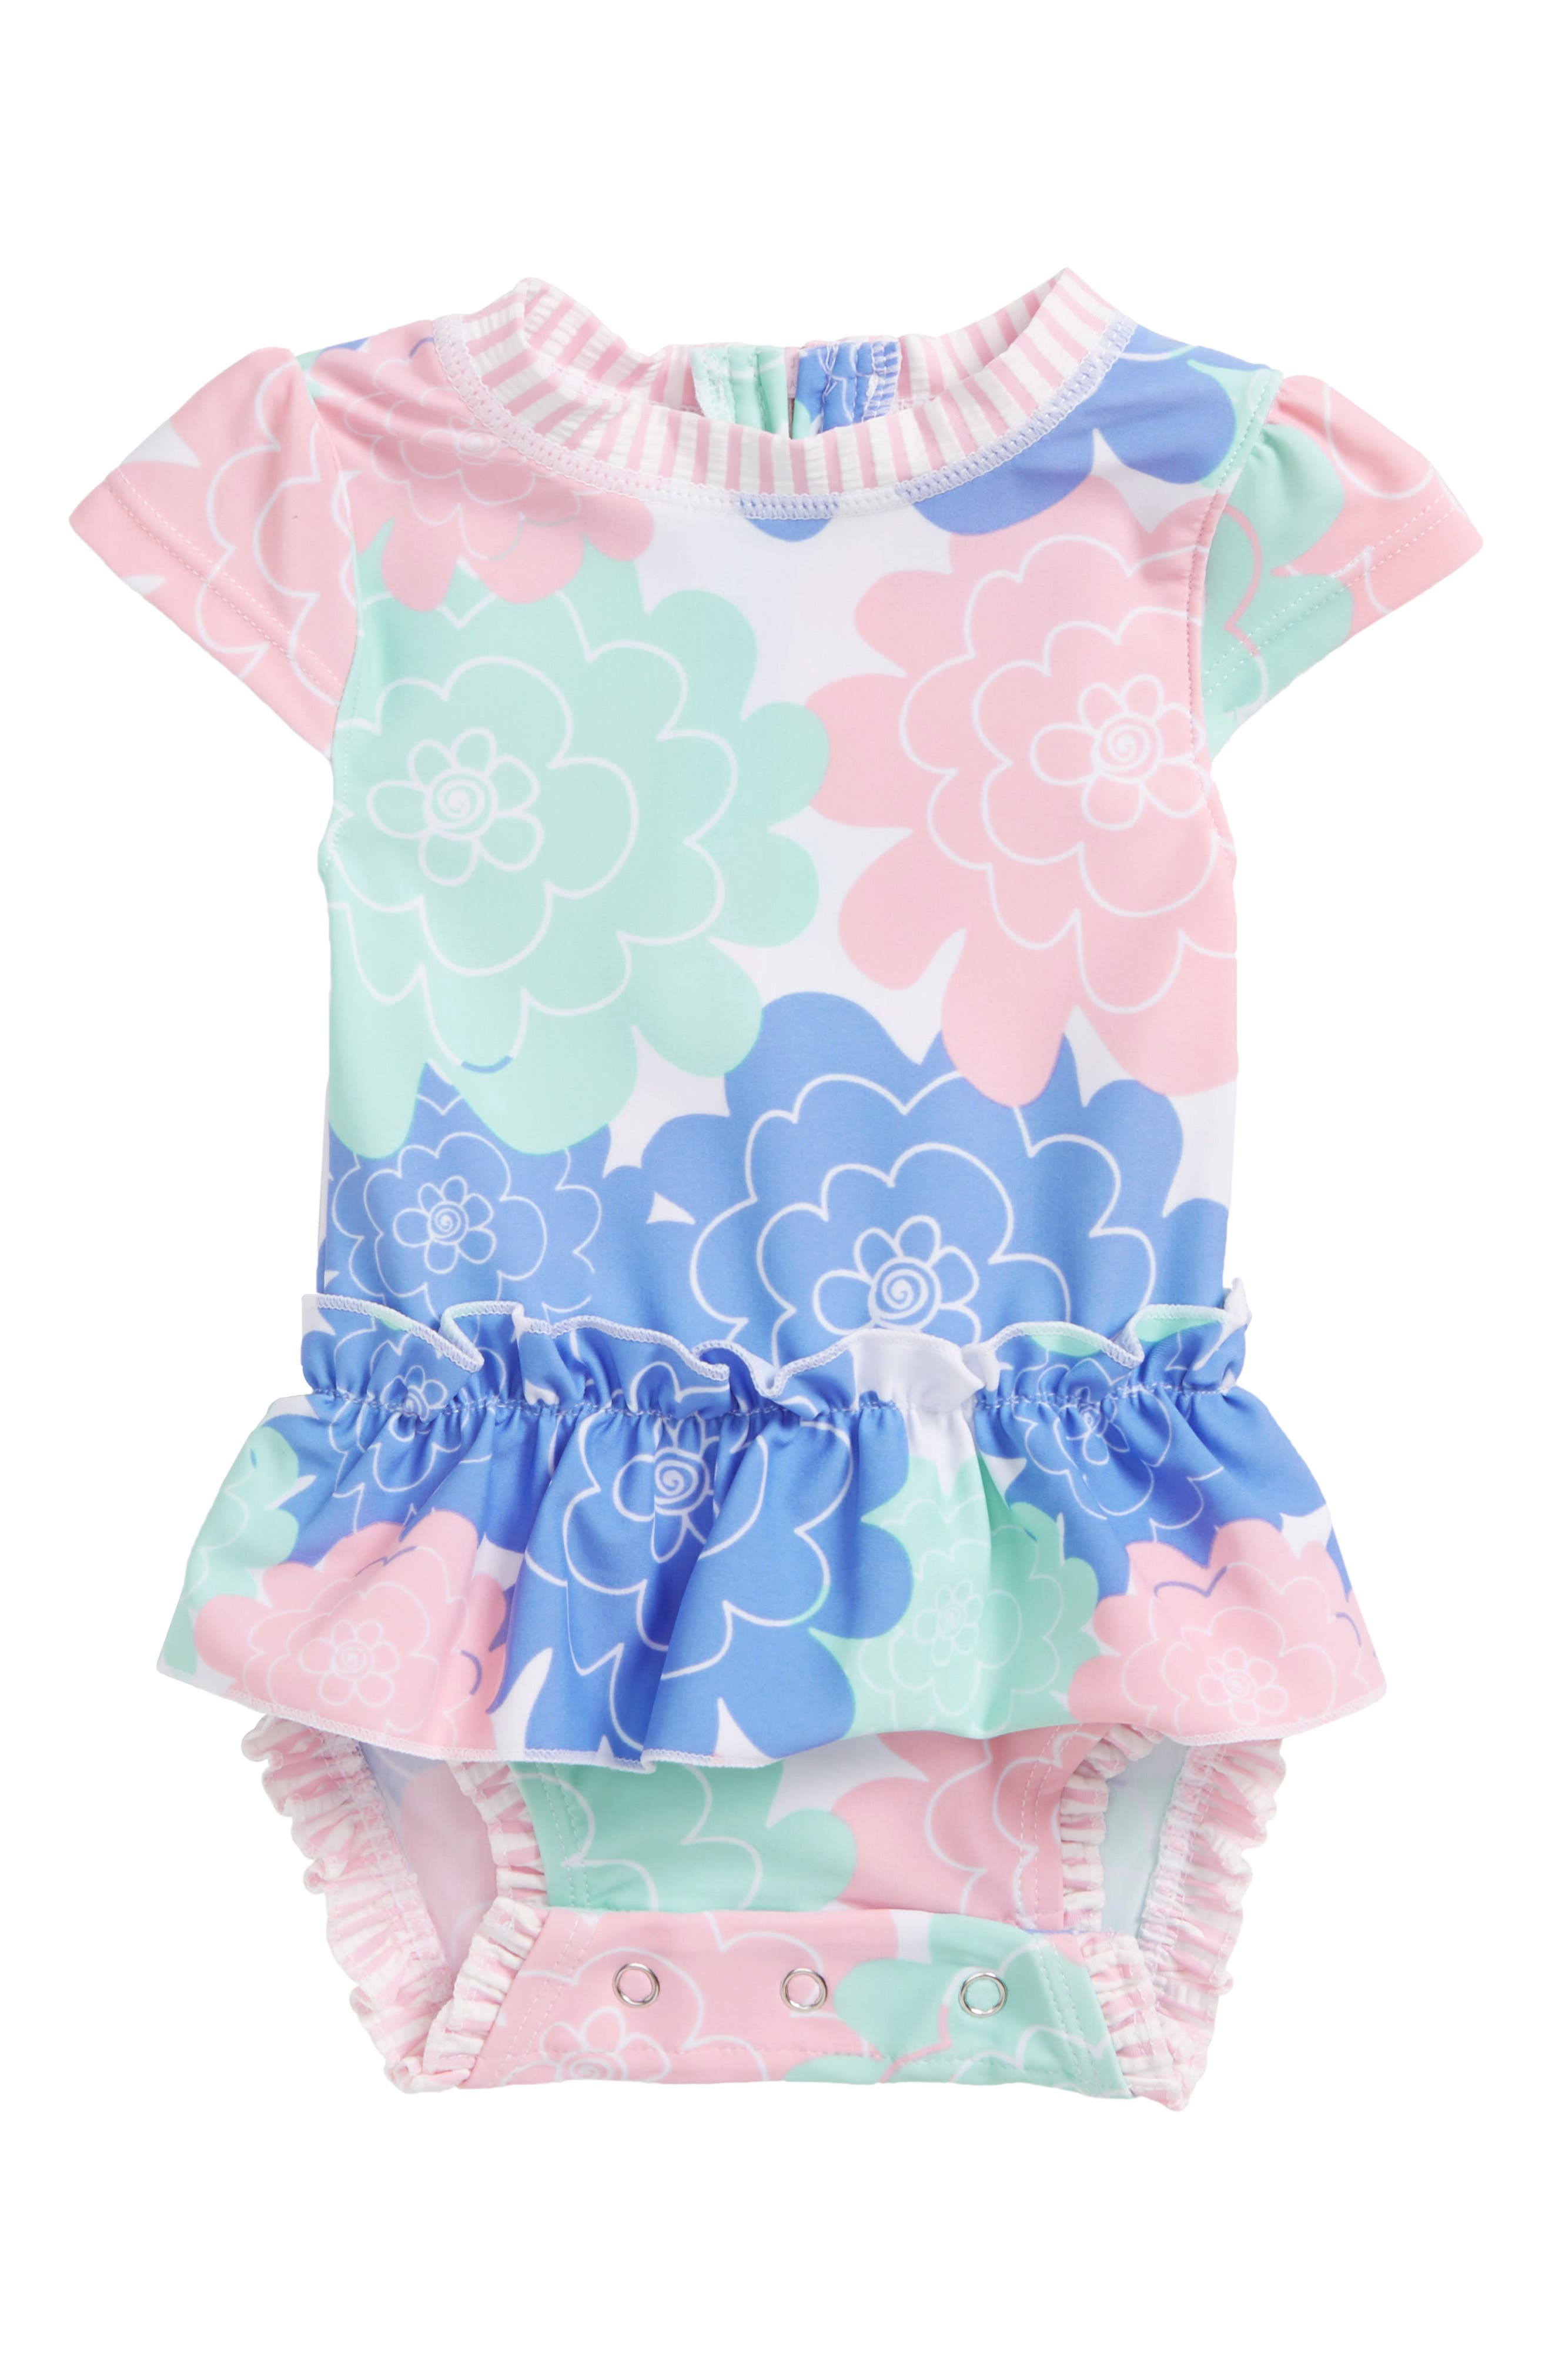 RUFFLEBUTTS,                             Pastel Petals Peplum One-Piece Swimsuit,                             Main thumbnail 1, color,                             180